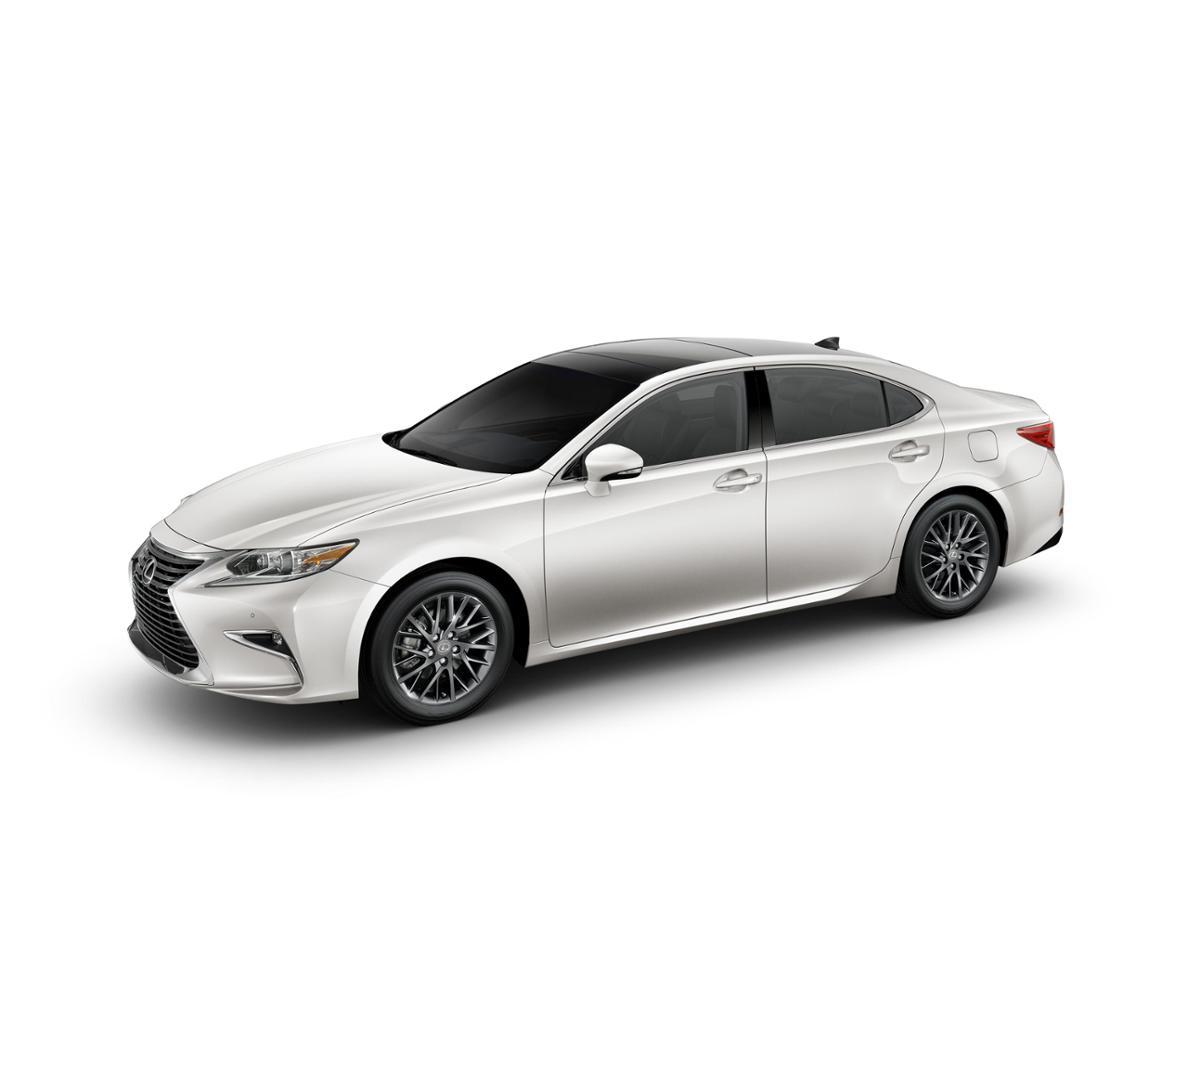 New Eminent White Pearl 2018 Lexus Es 350 For Sale Santa